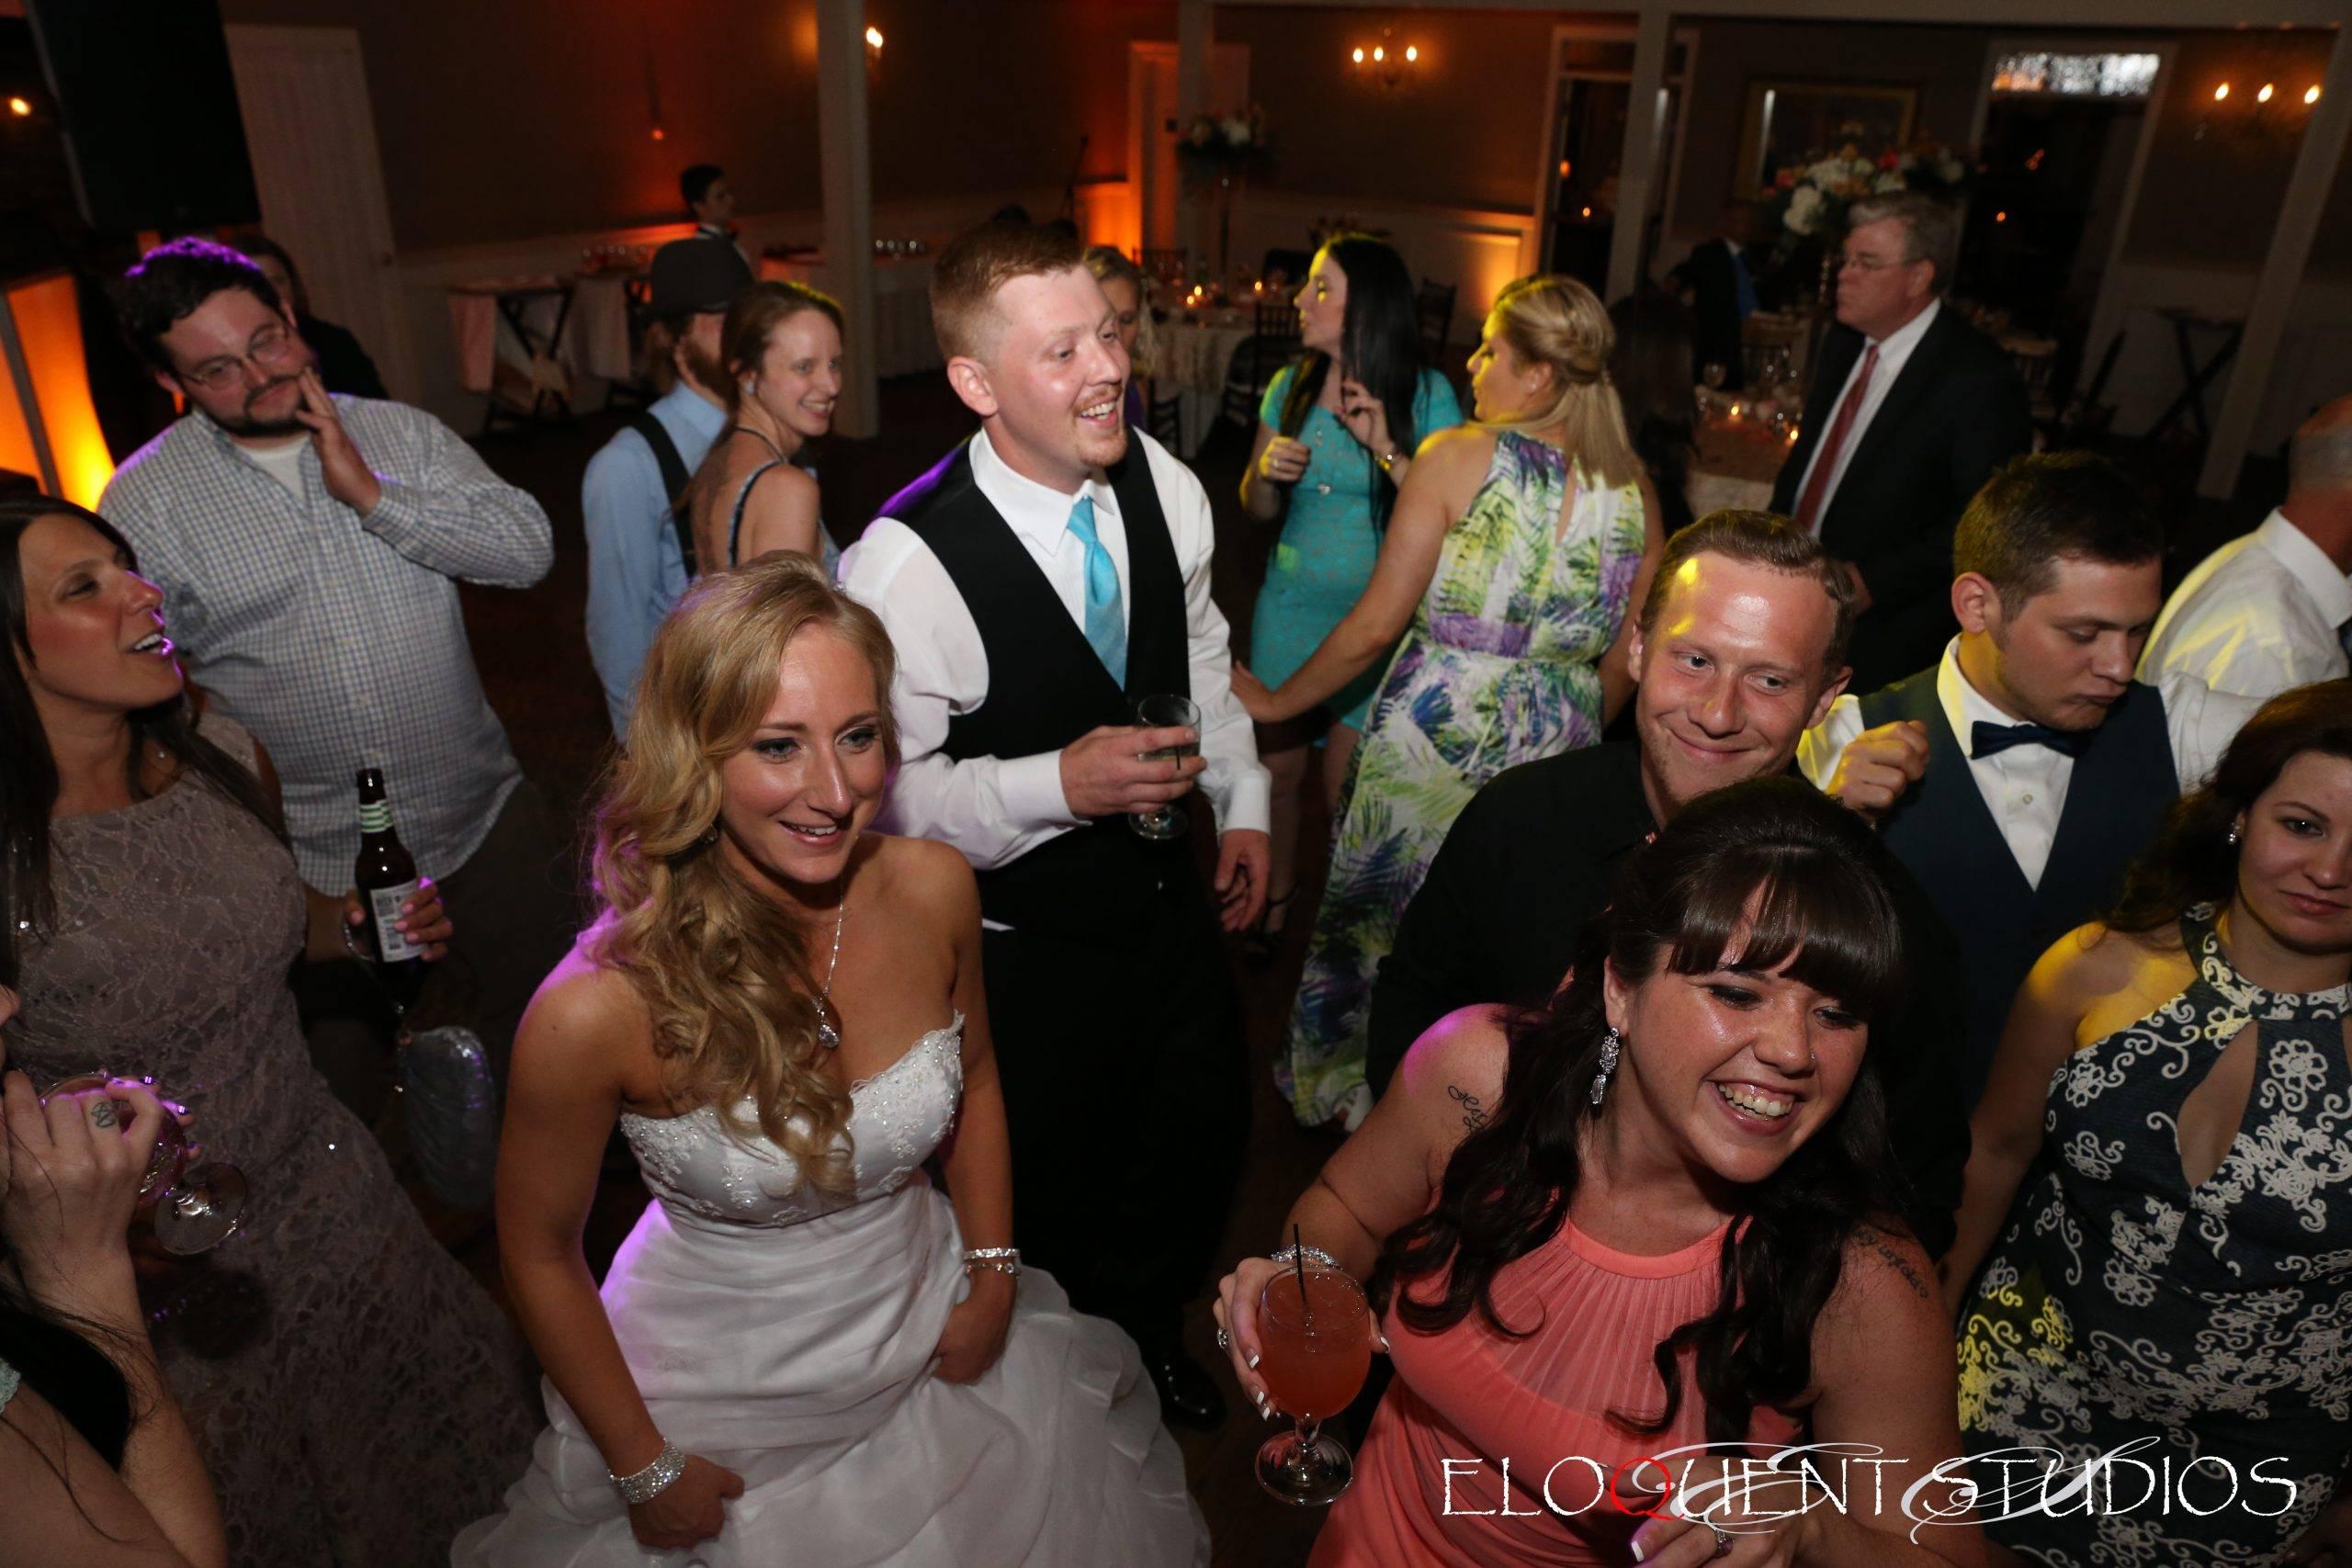 David's Country Inn wedding guests dancing